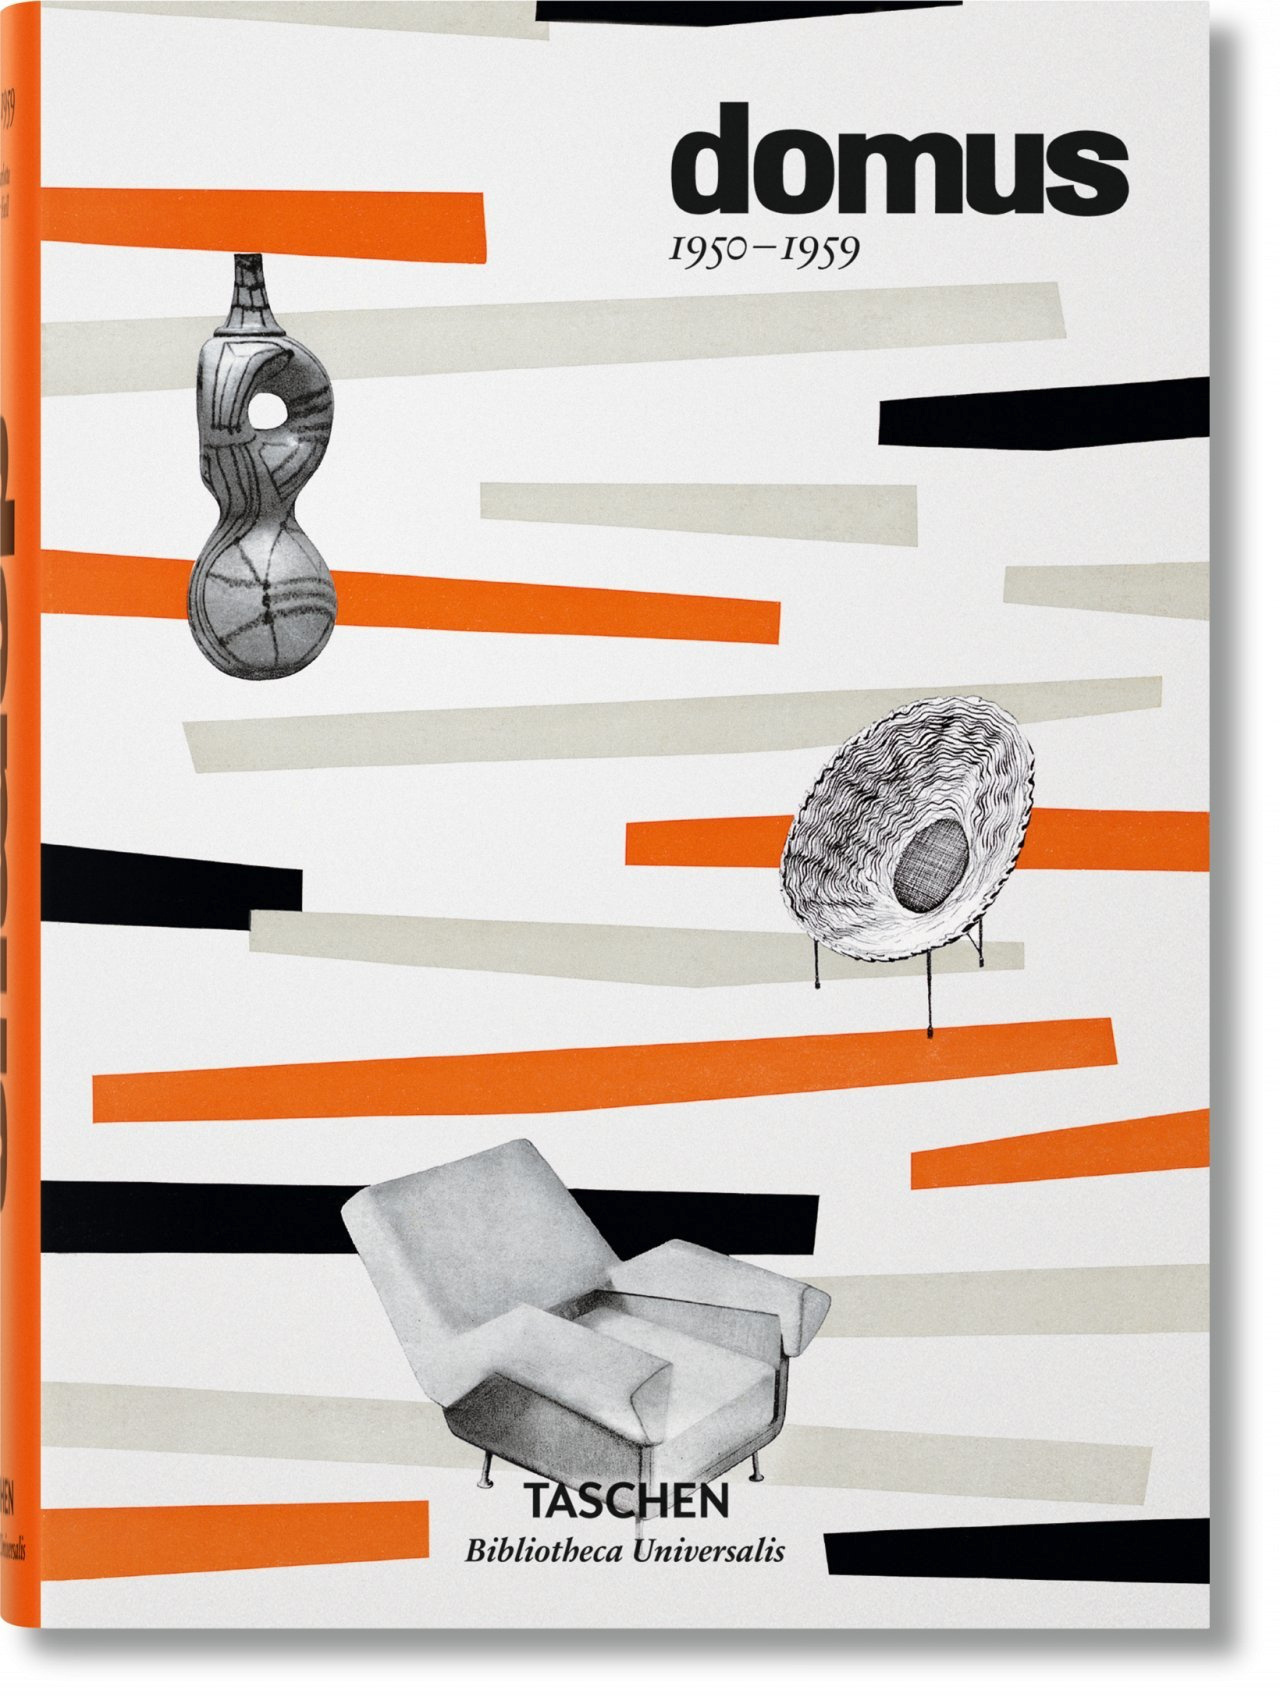 DOMUS 1950S - BU